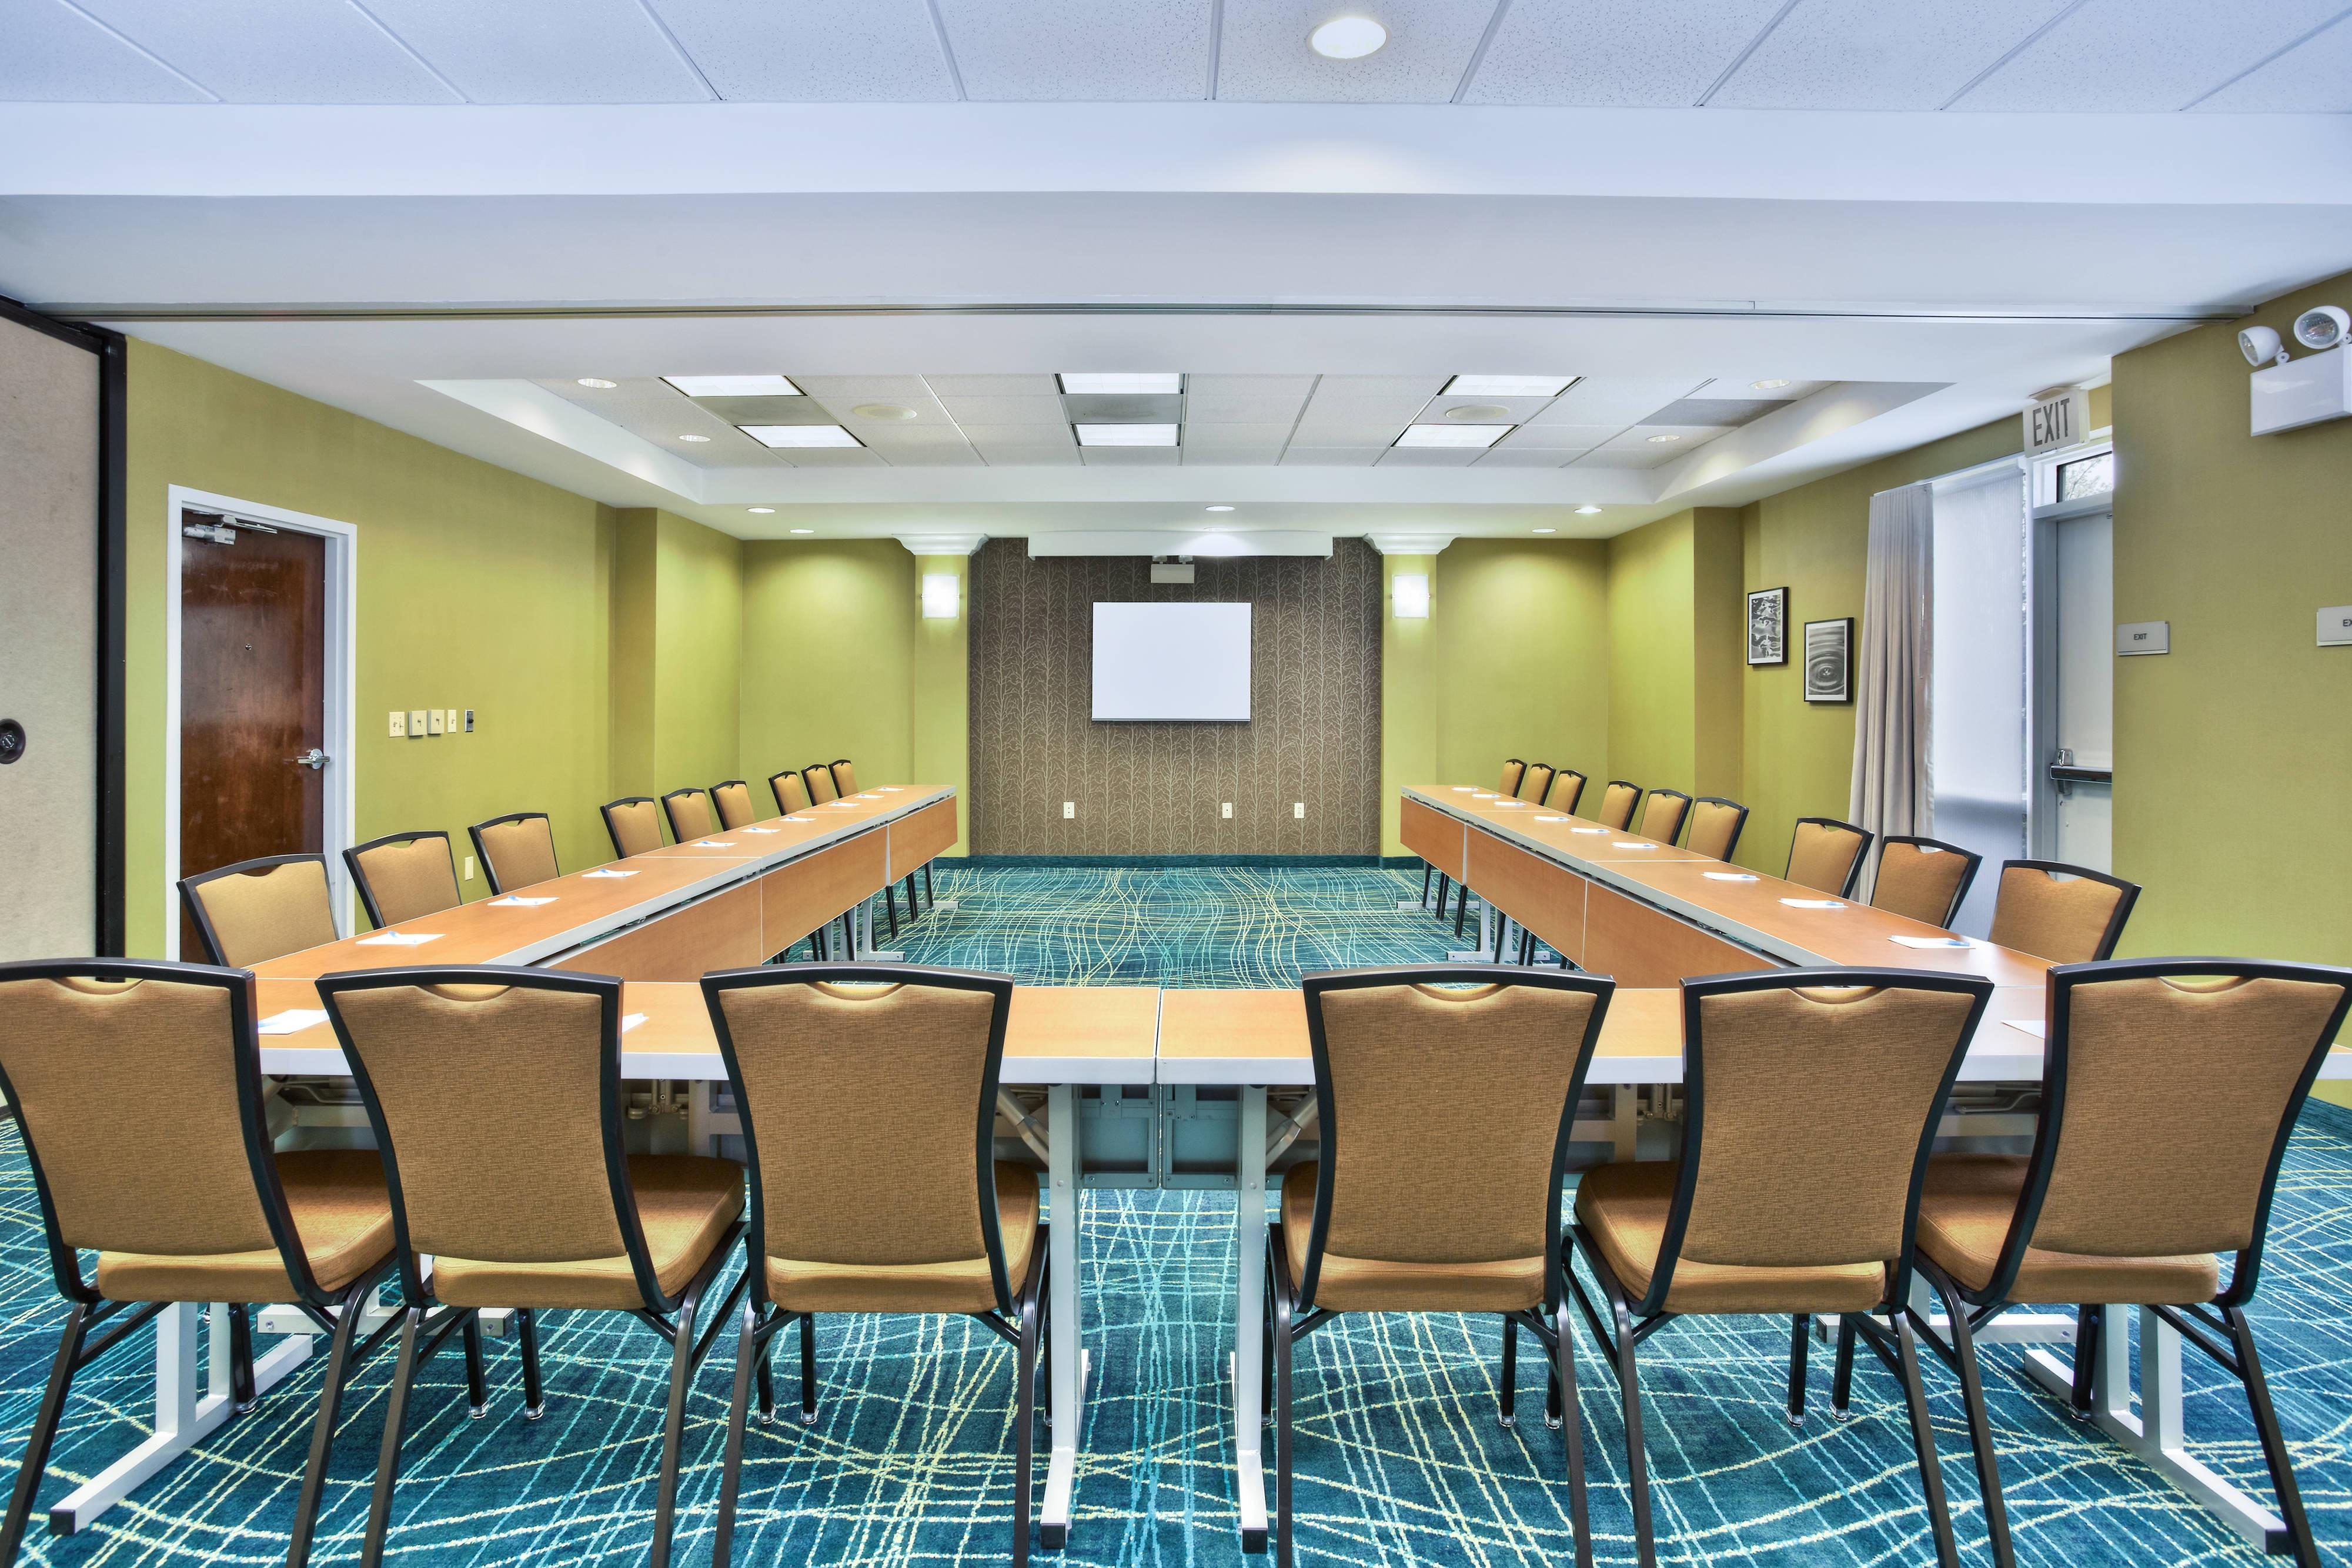 SpringHill Suites Chicago Southwest at Burr Ridge/Hinsdale Meeting Room U-shape Setup